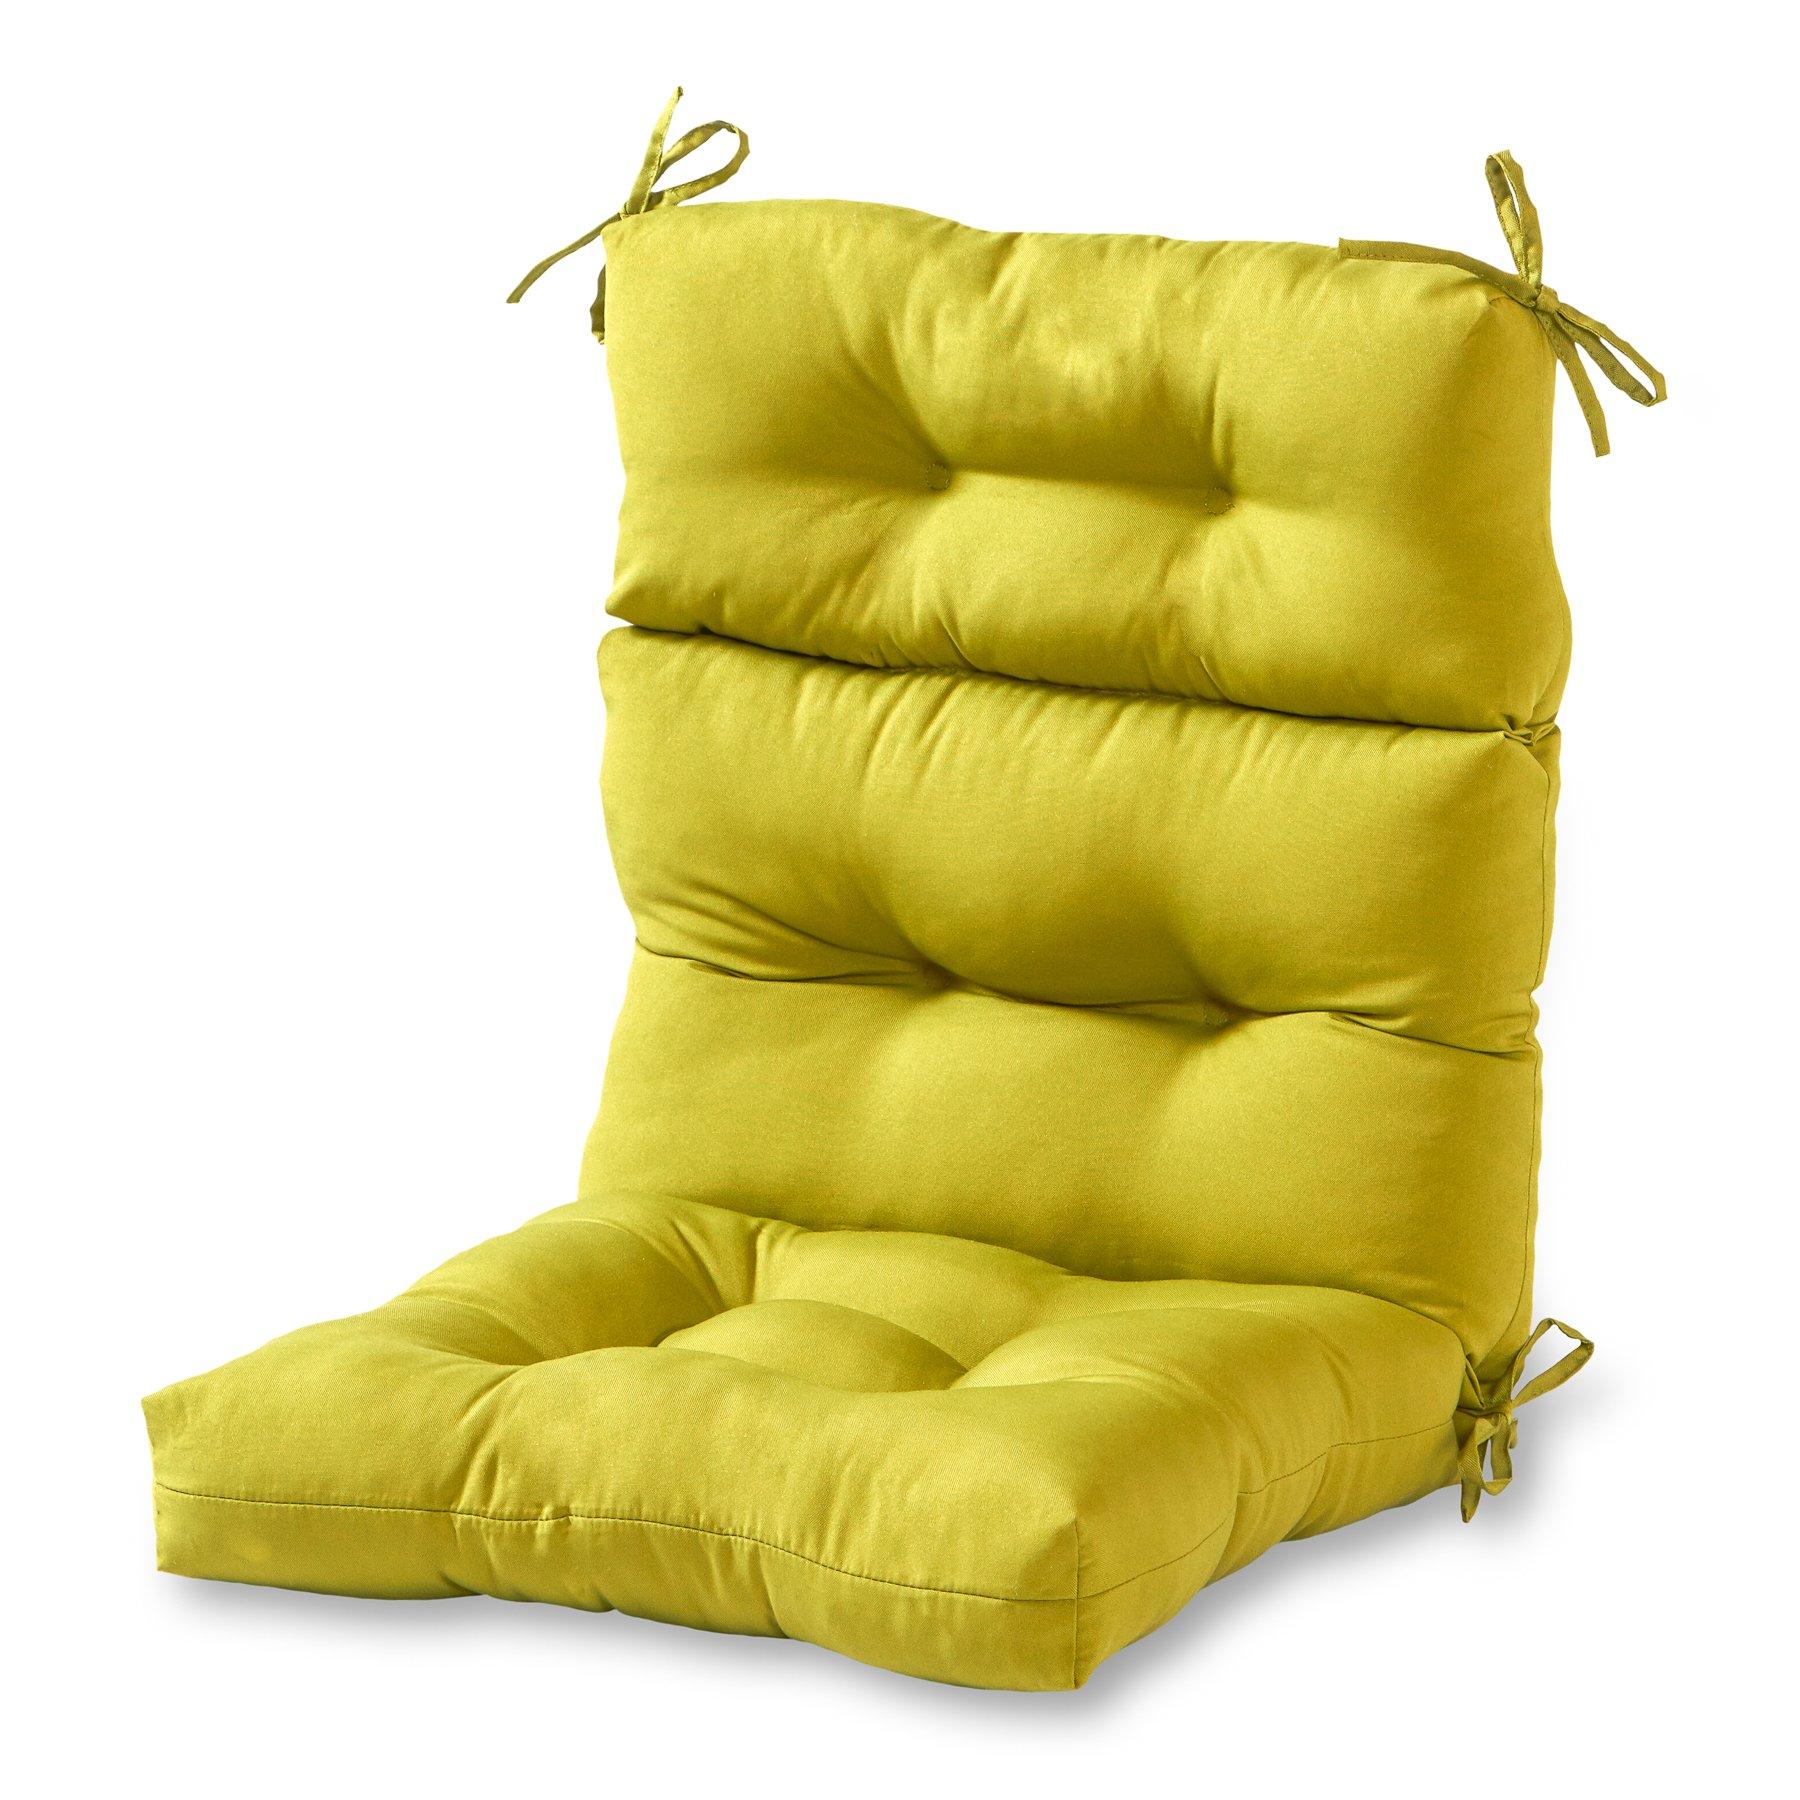 Amazon.com : QILLOWAY Outdoor Seat/Back Chair Cushion ...